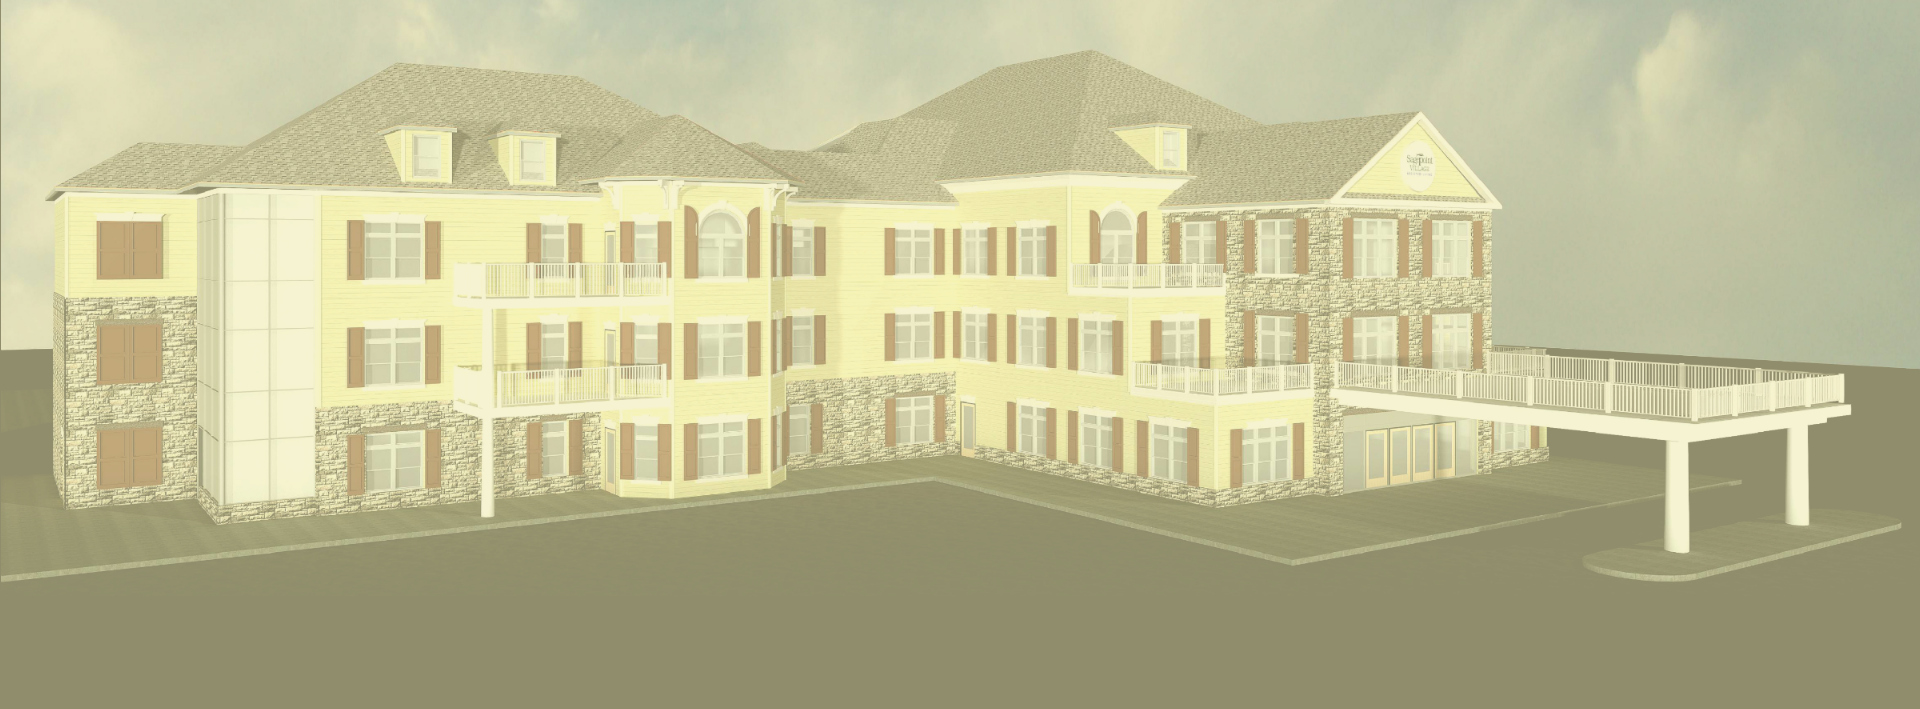 Sagepoint Village Assisted Living